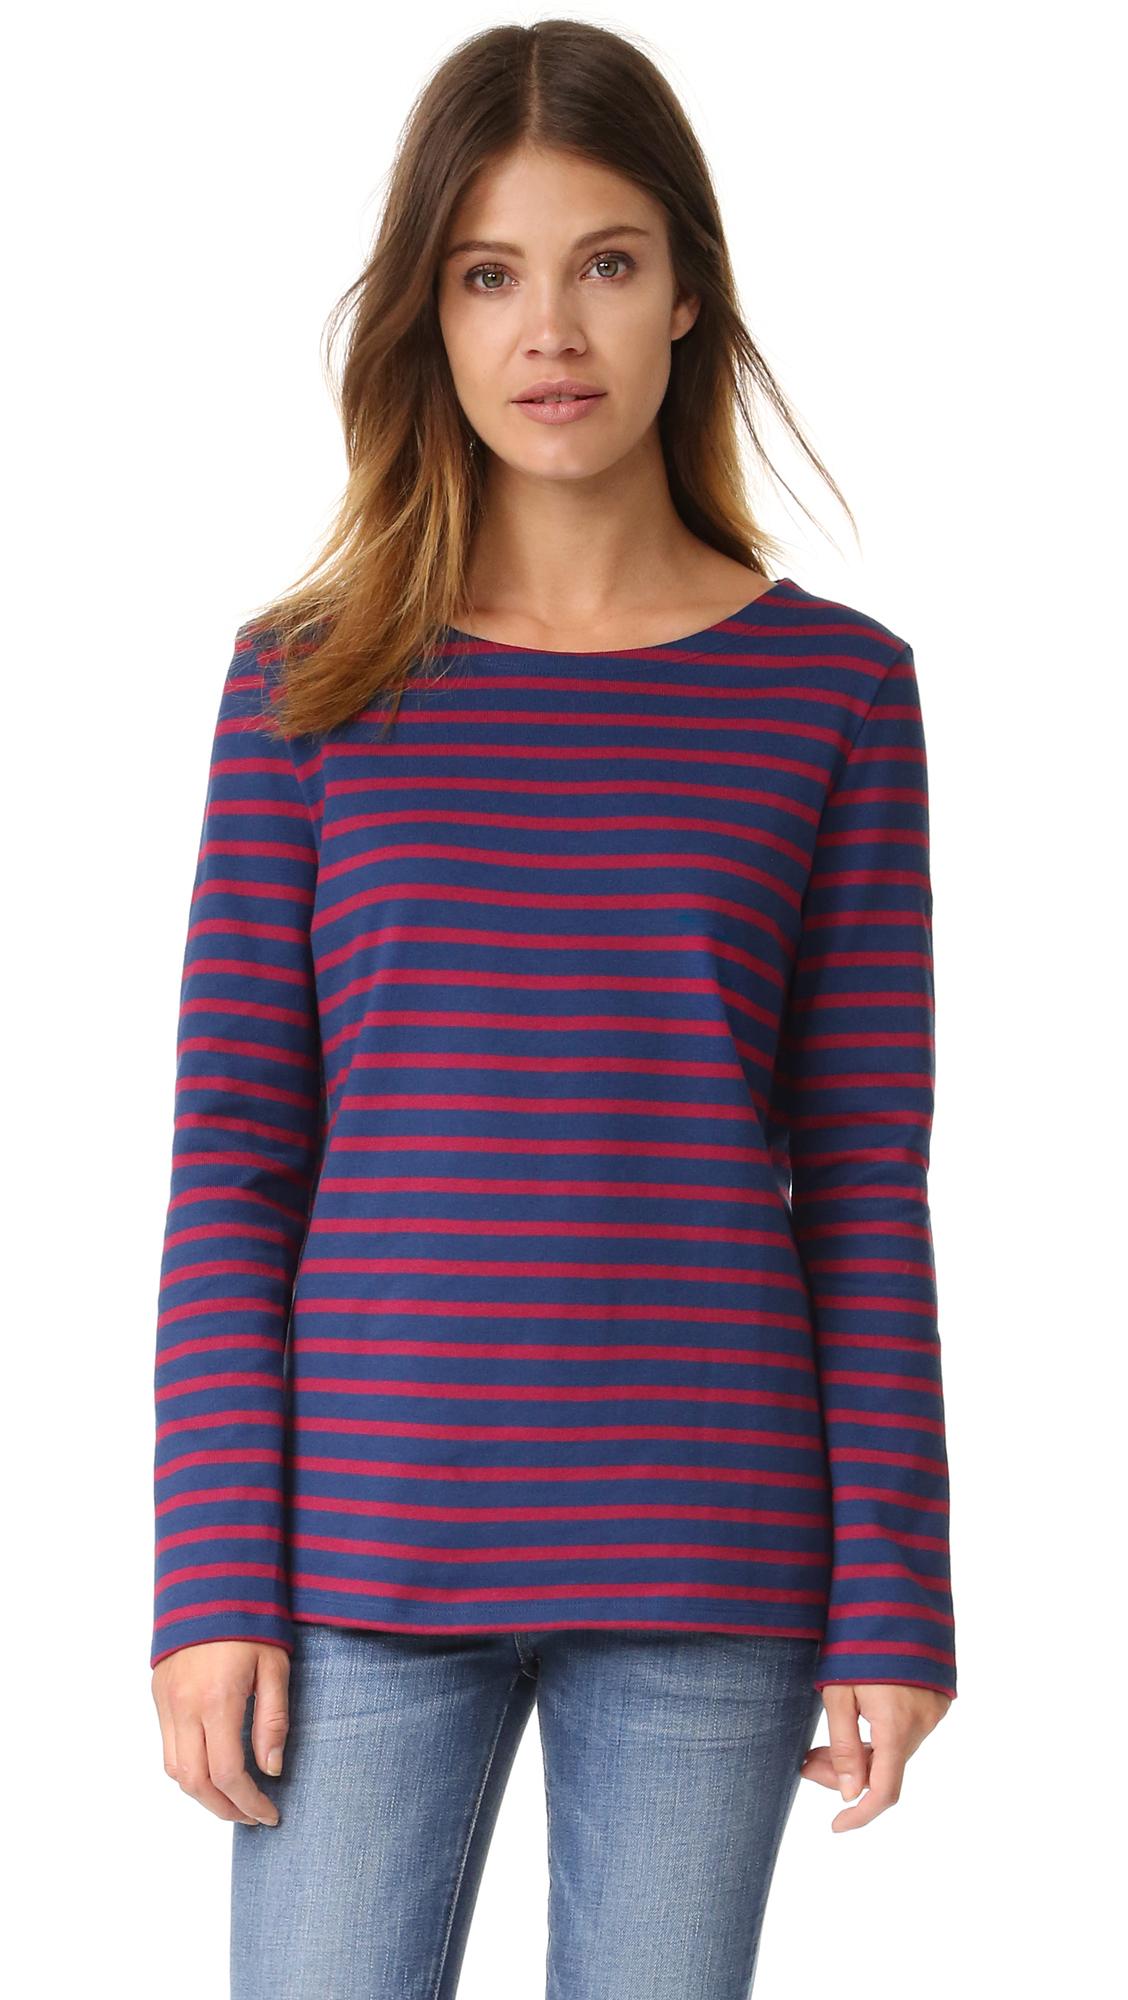 Petit bateau hannah horizontal stripe tee lyst for Petit bateau striped shirt